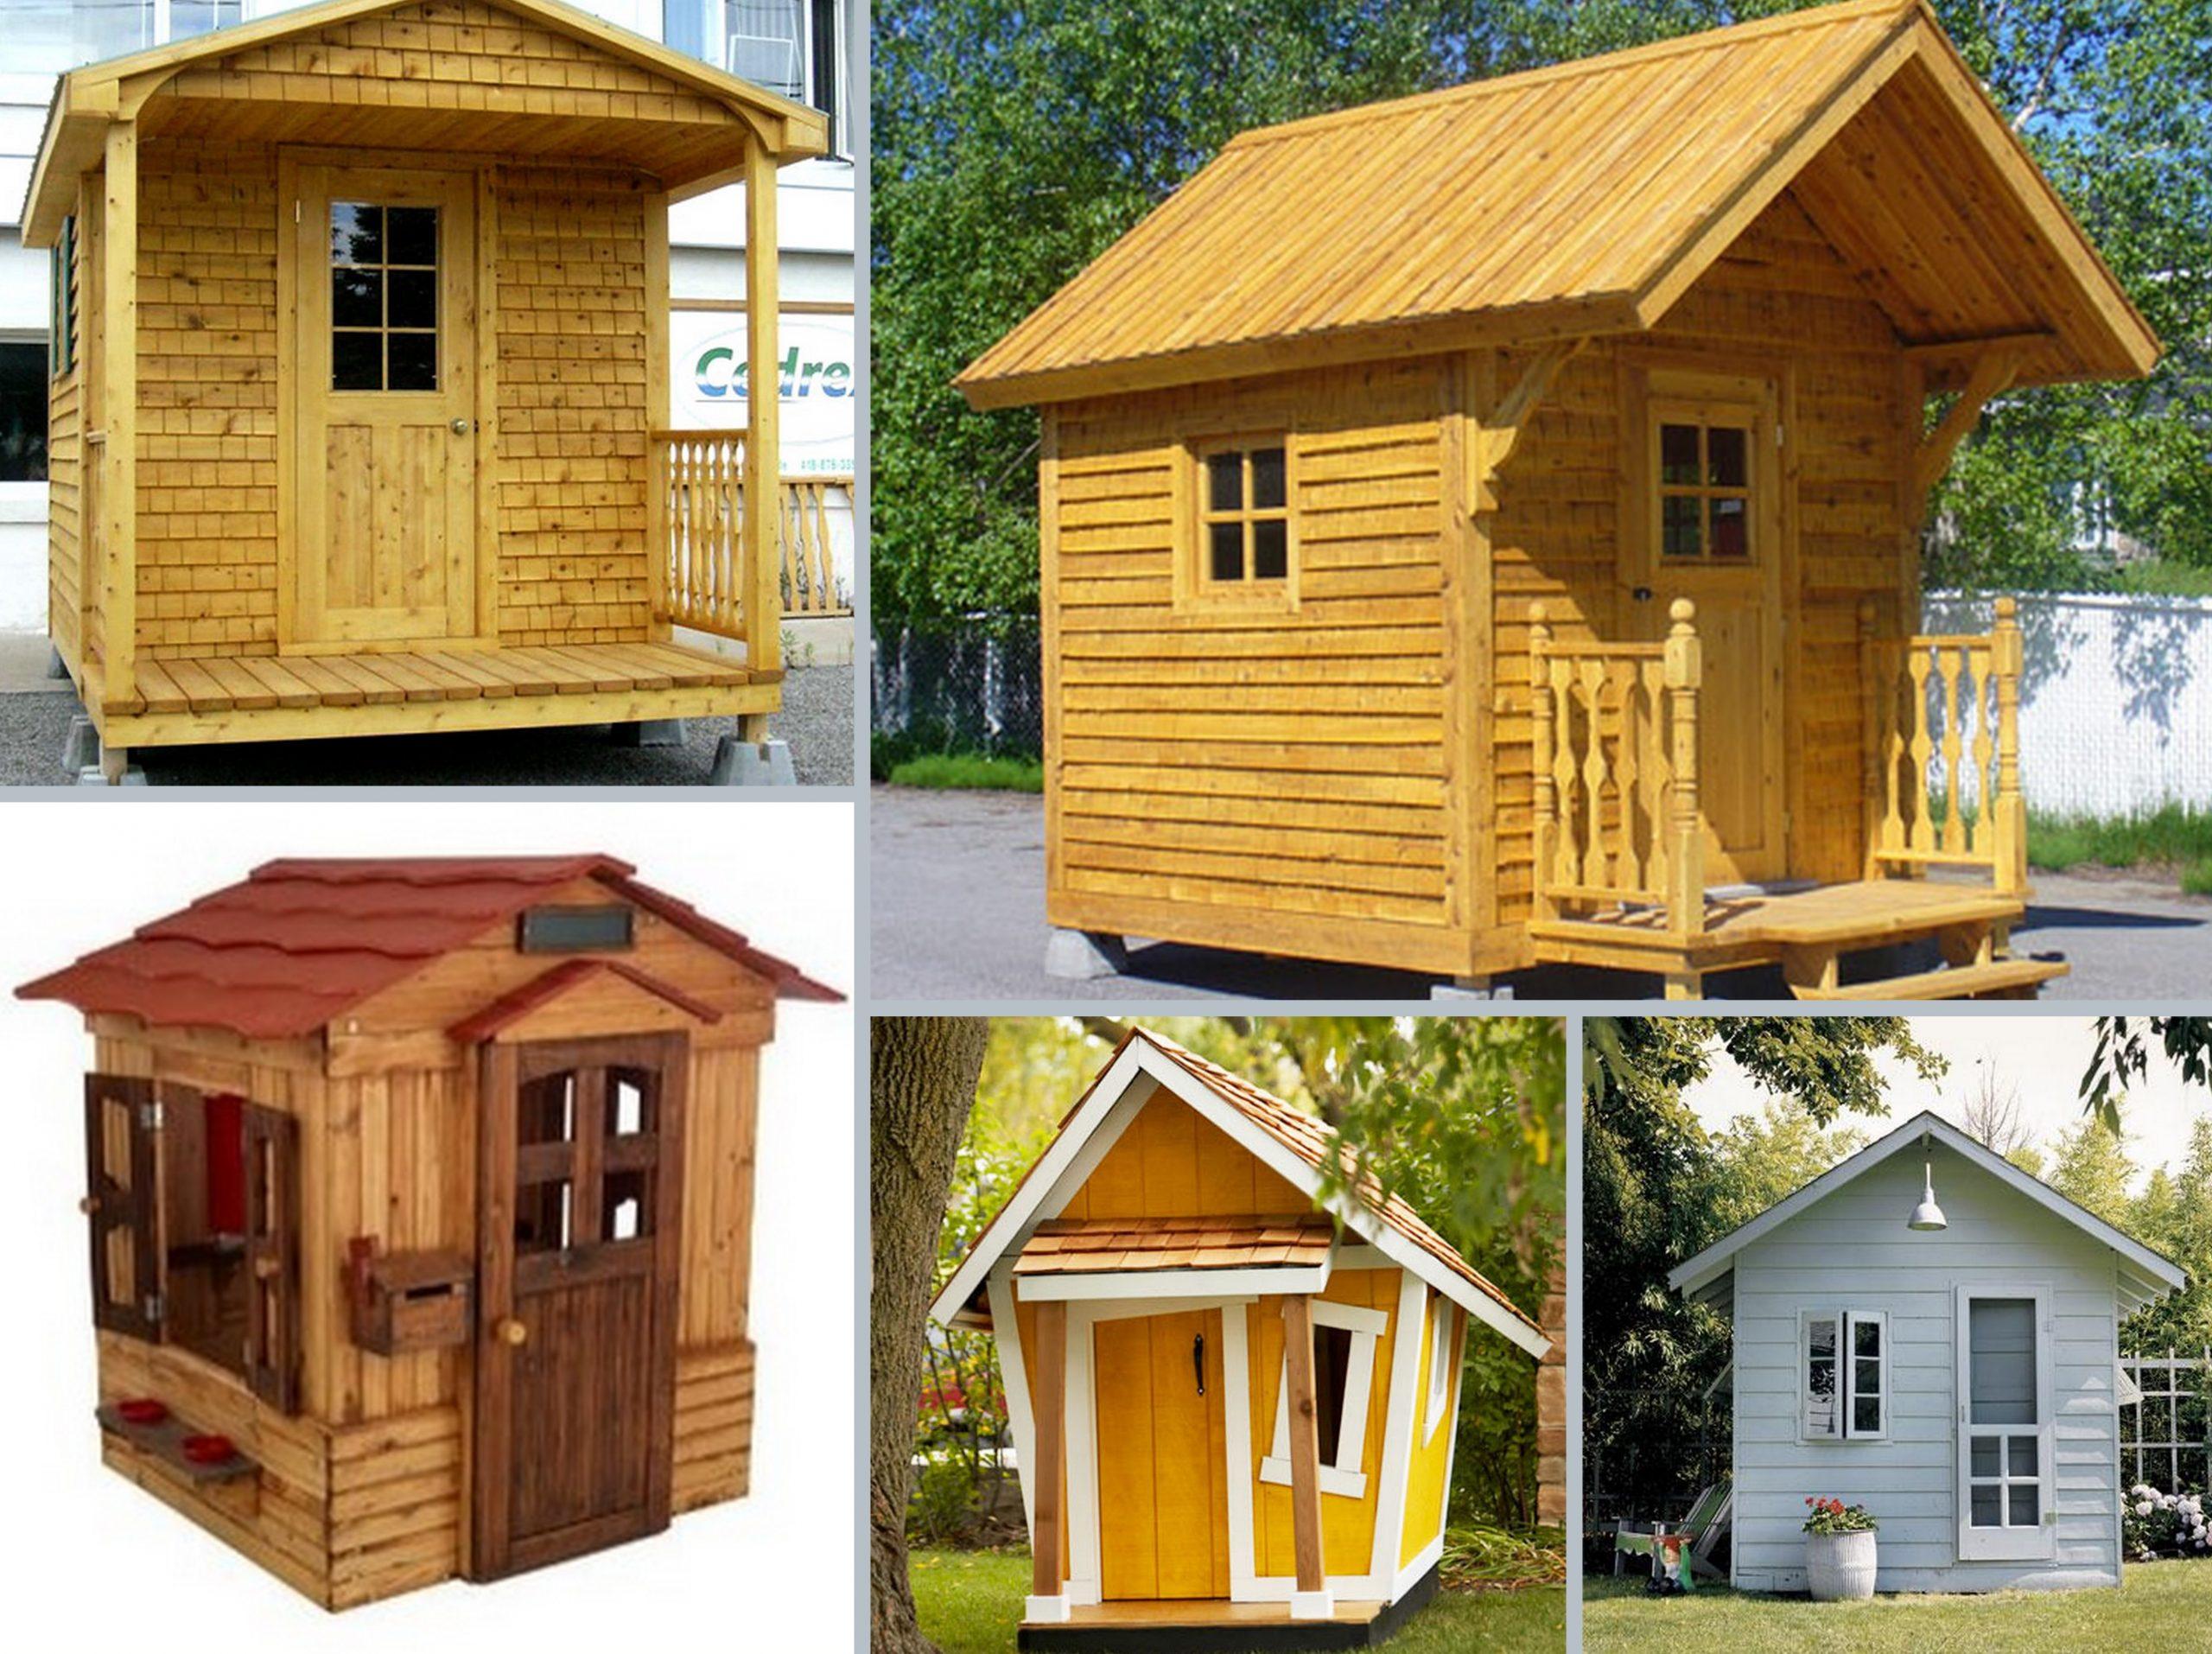 Construire Sa Maison En Bois serapportantà Abri De Jardin Le Bon Coin